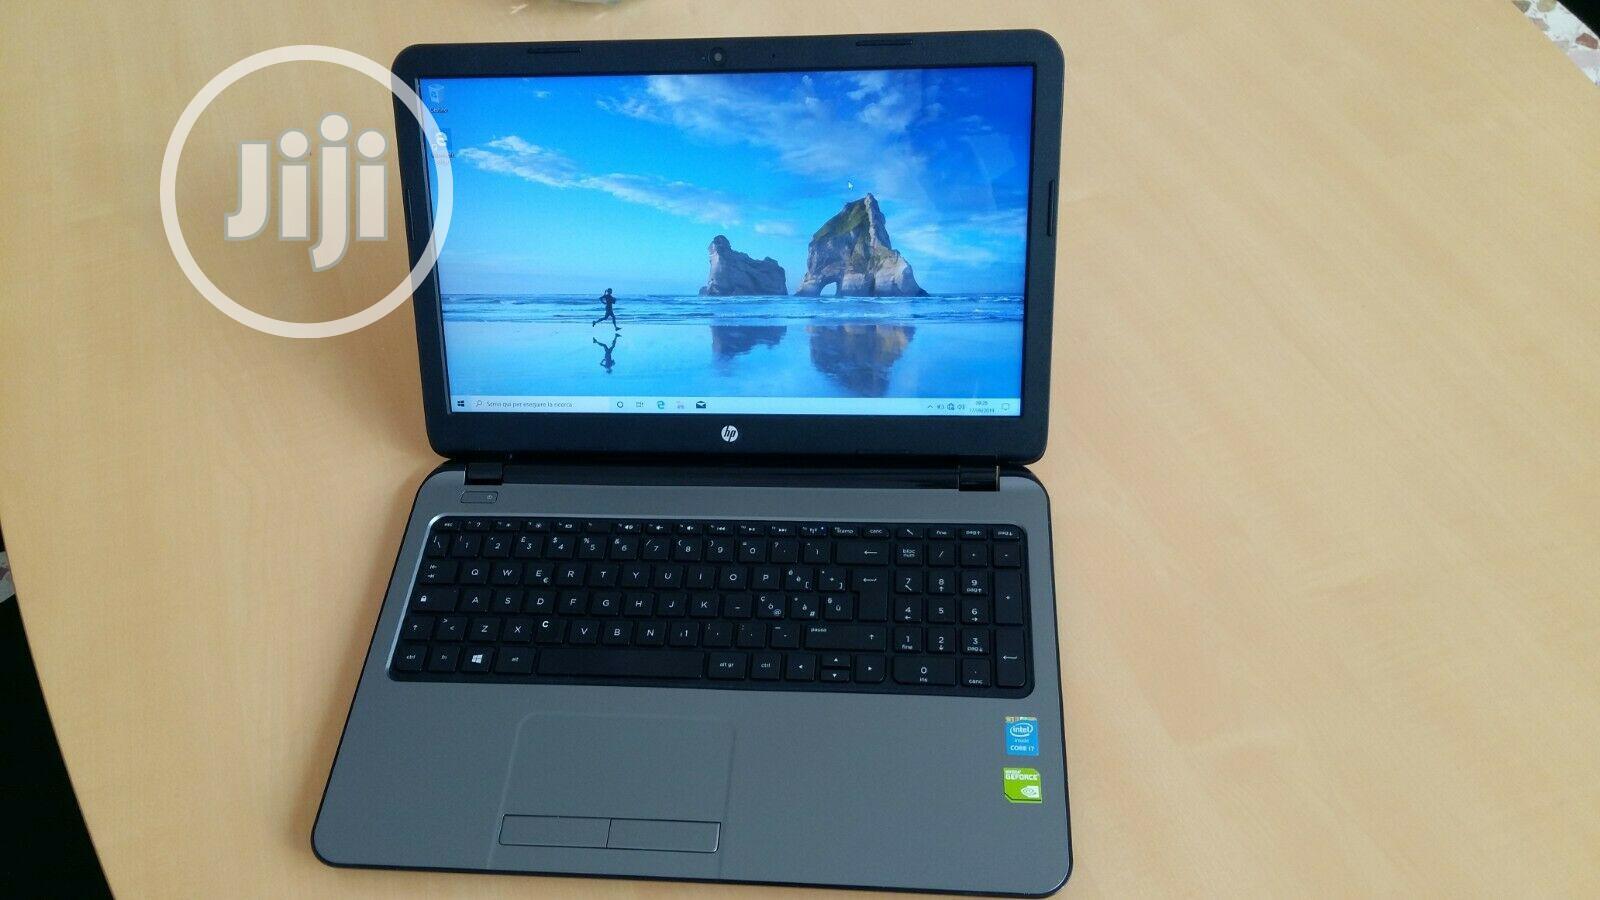 New Laptop HP Envy Ultrabook 4 12GB Intel Core i7 HDD 1T